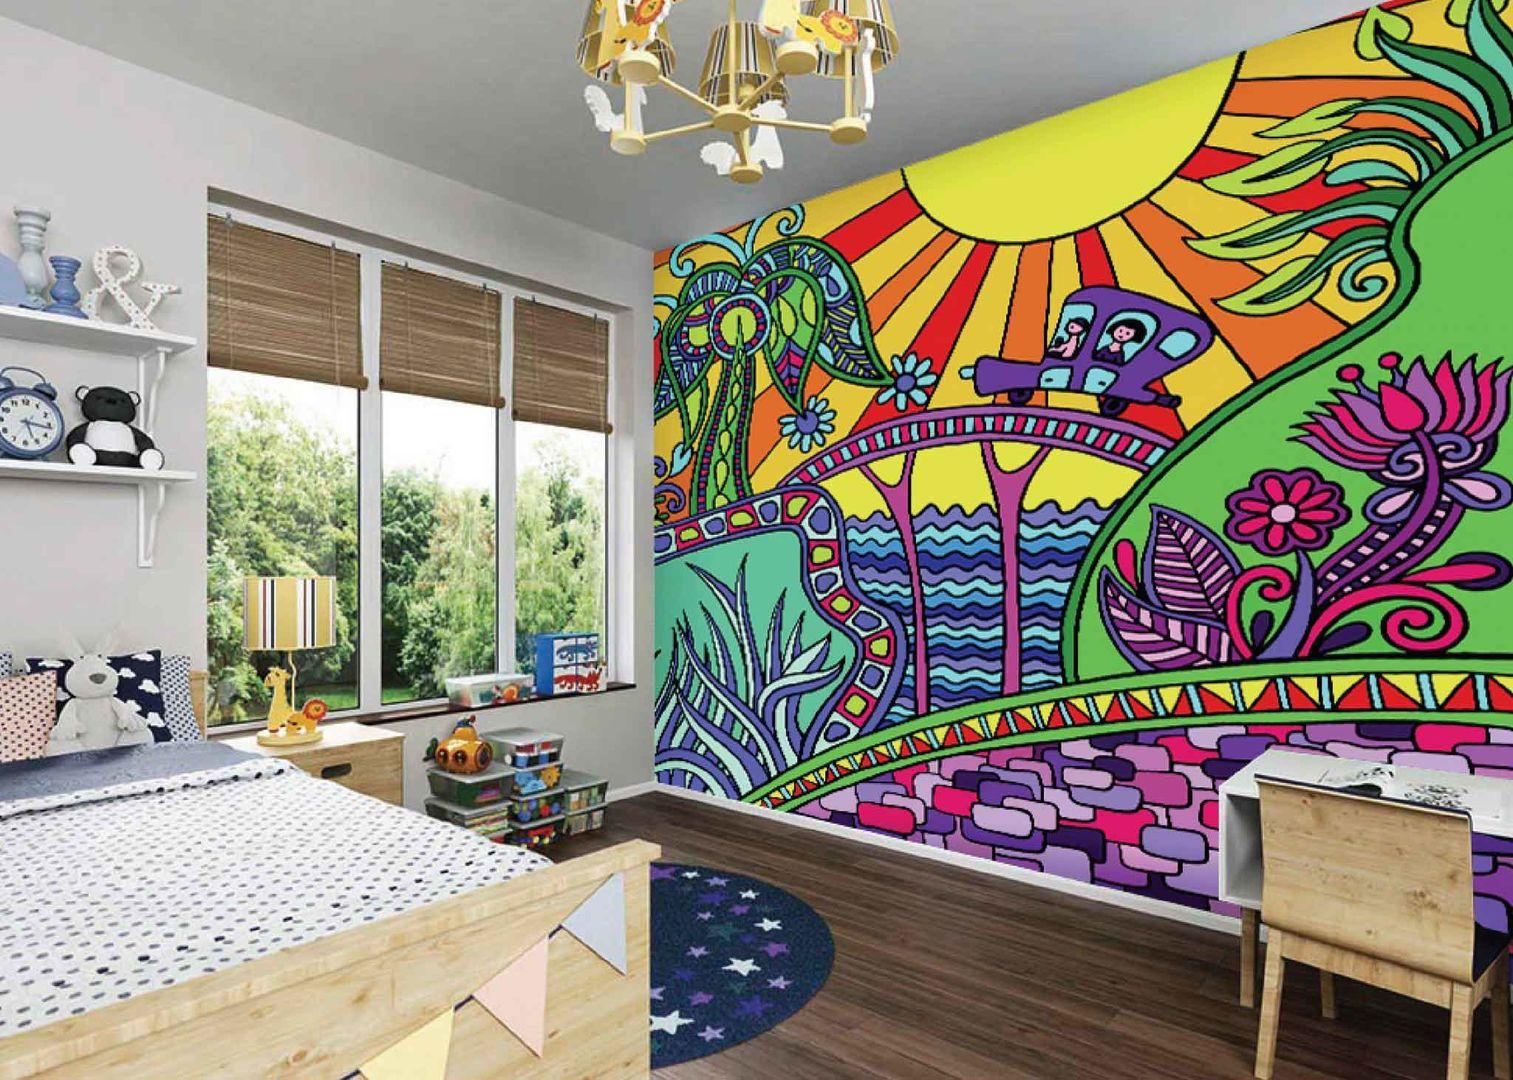 Wall Graphic | Wall Art Design - Digital Living